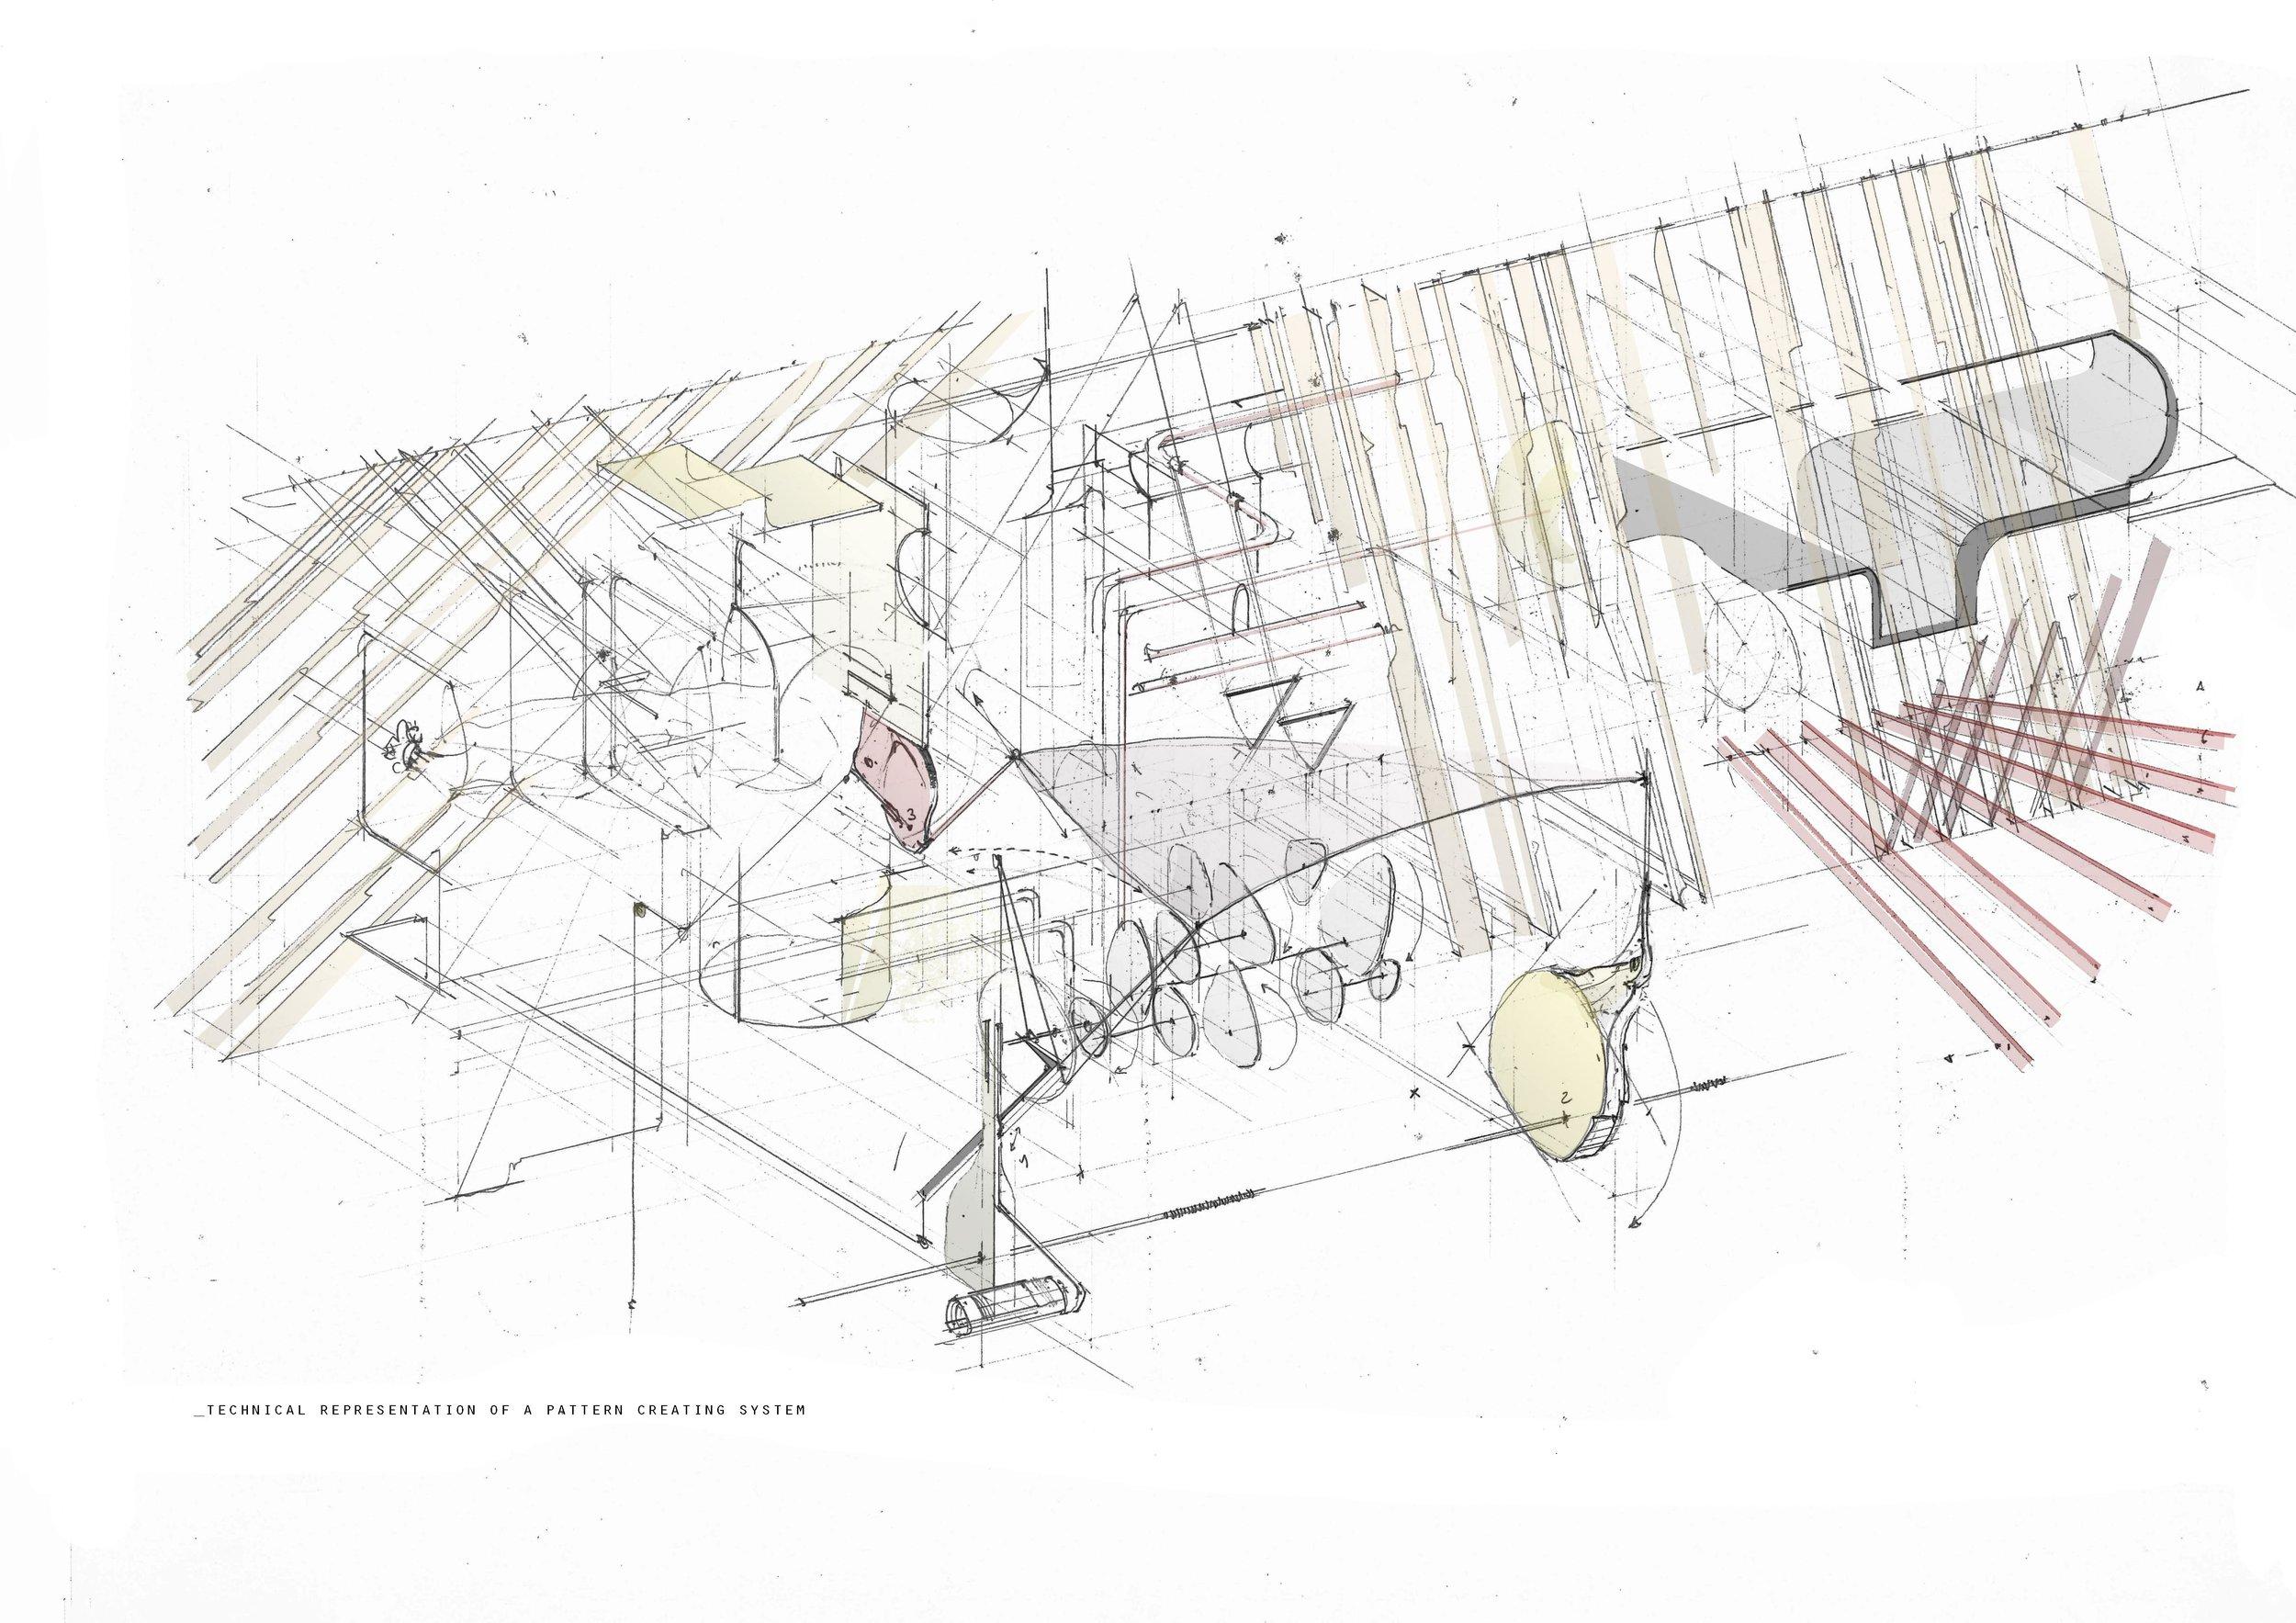 facade_mechanism_test_techincal_drawing_ileauxcygnes_paris_film_studio_complex_y3-min.jpg